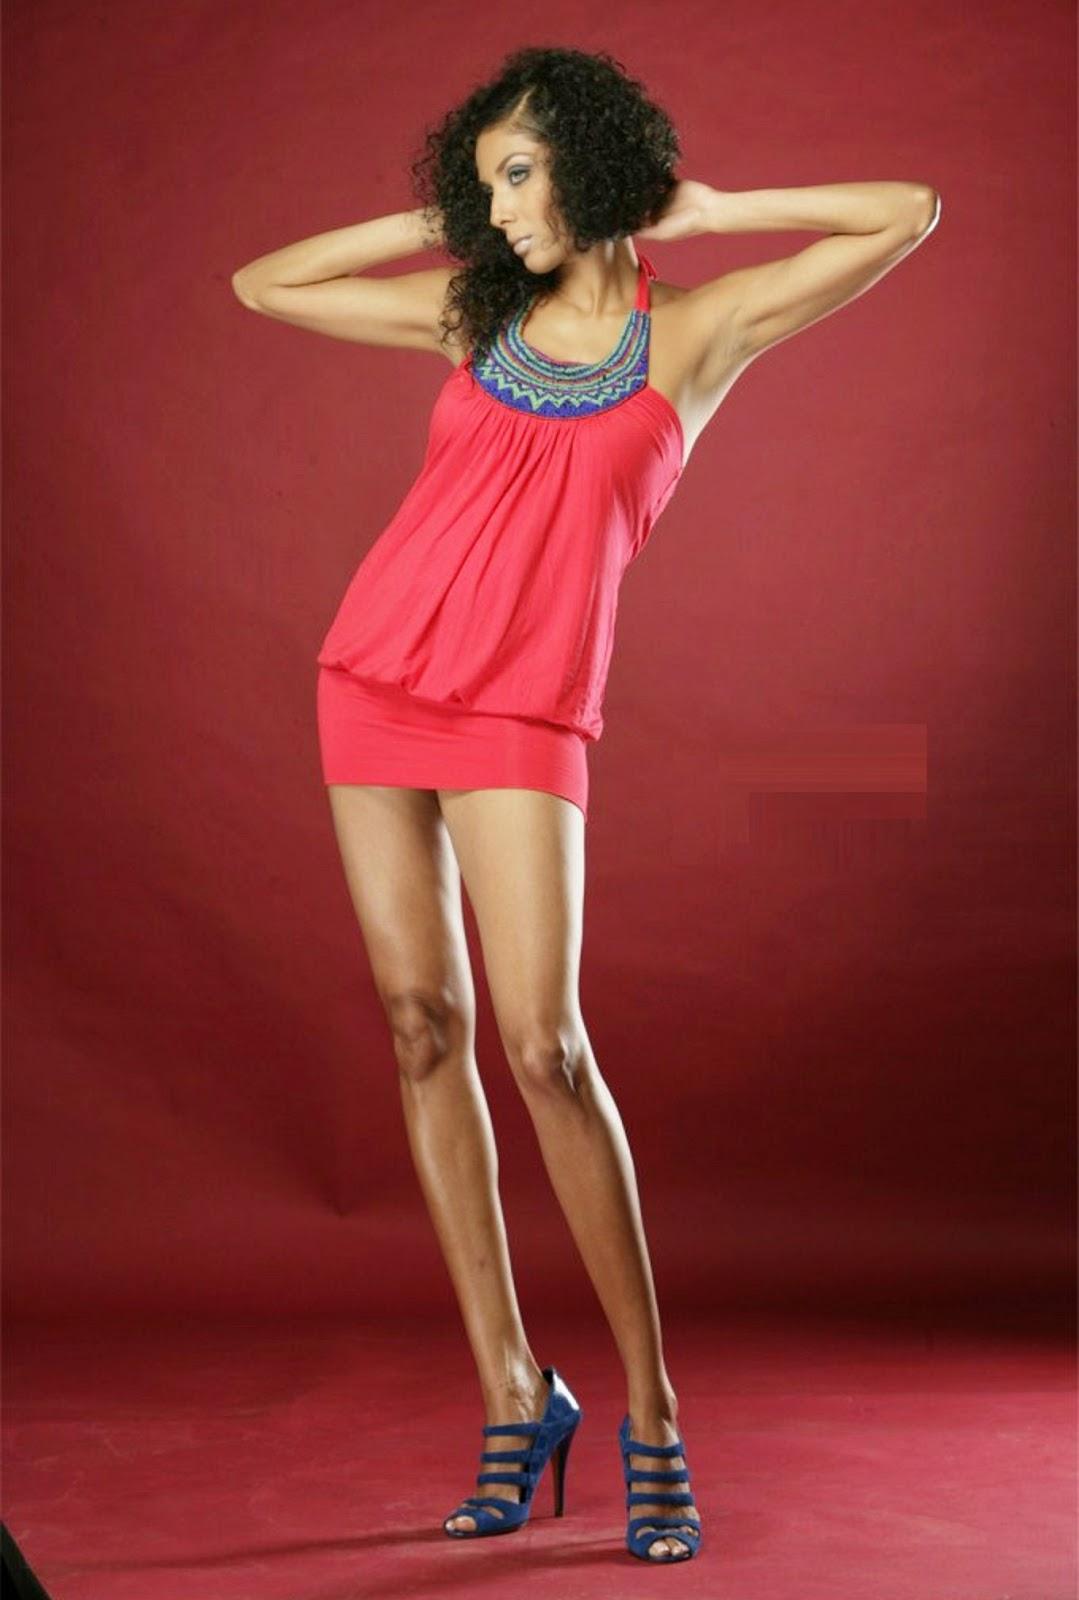 Bigg Boss season 8 Contestants Diandra Soares Wallpapers Free Download